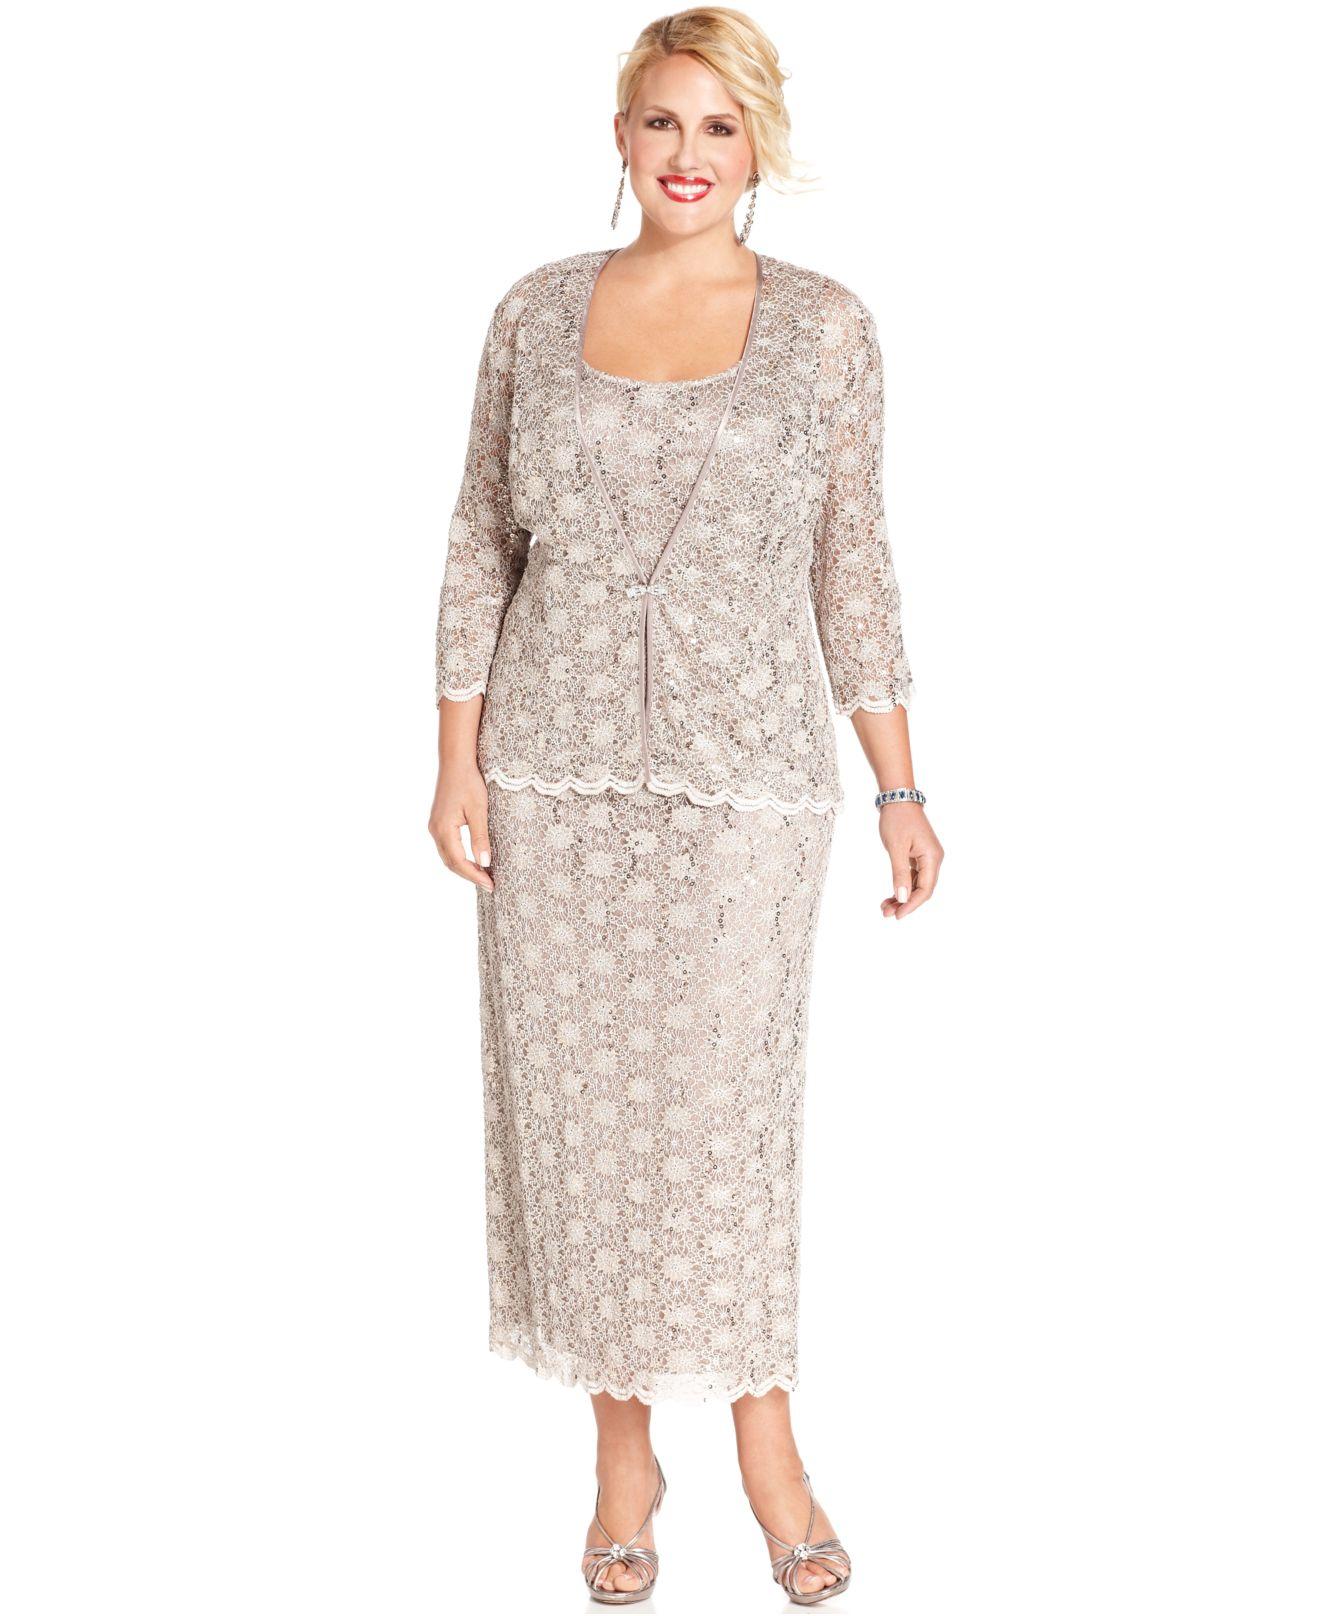 R & m richards Plus Size Dress And Jacket, Sleeveless Sequined ...